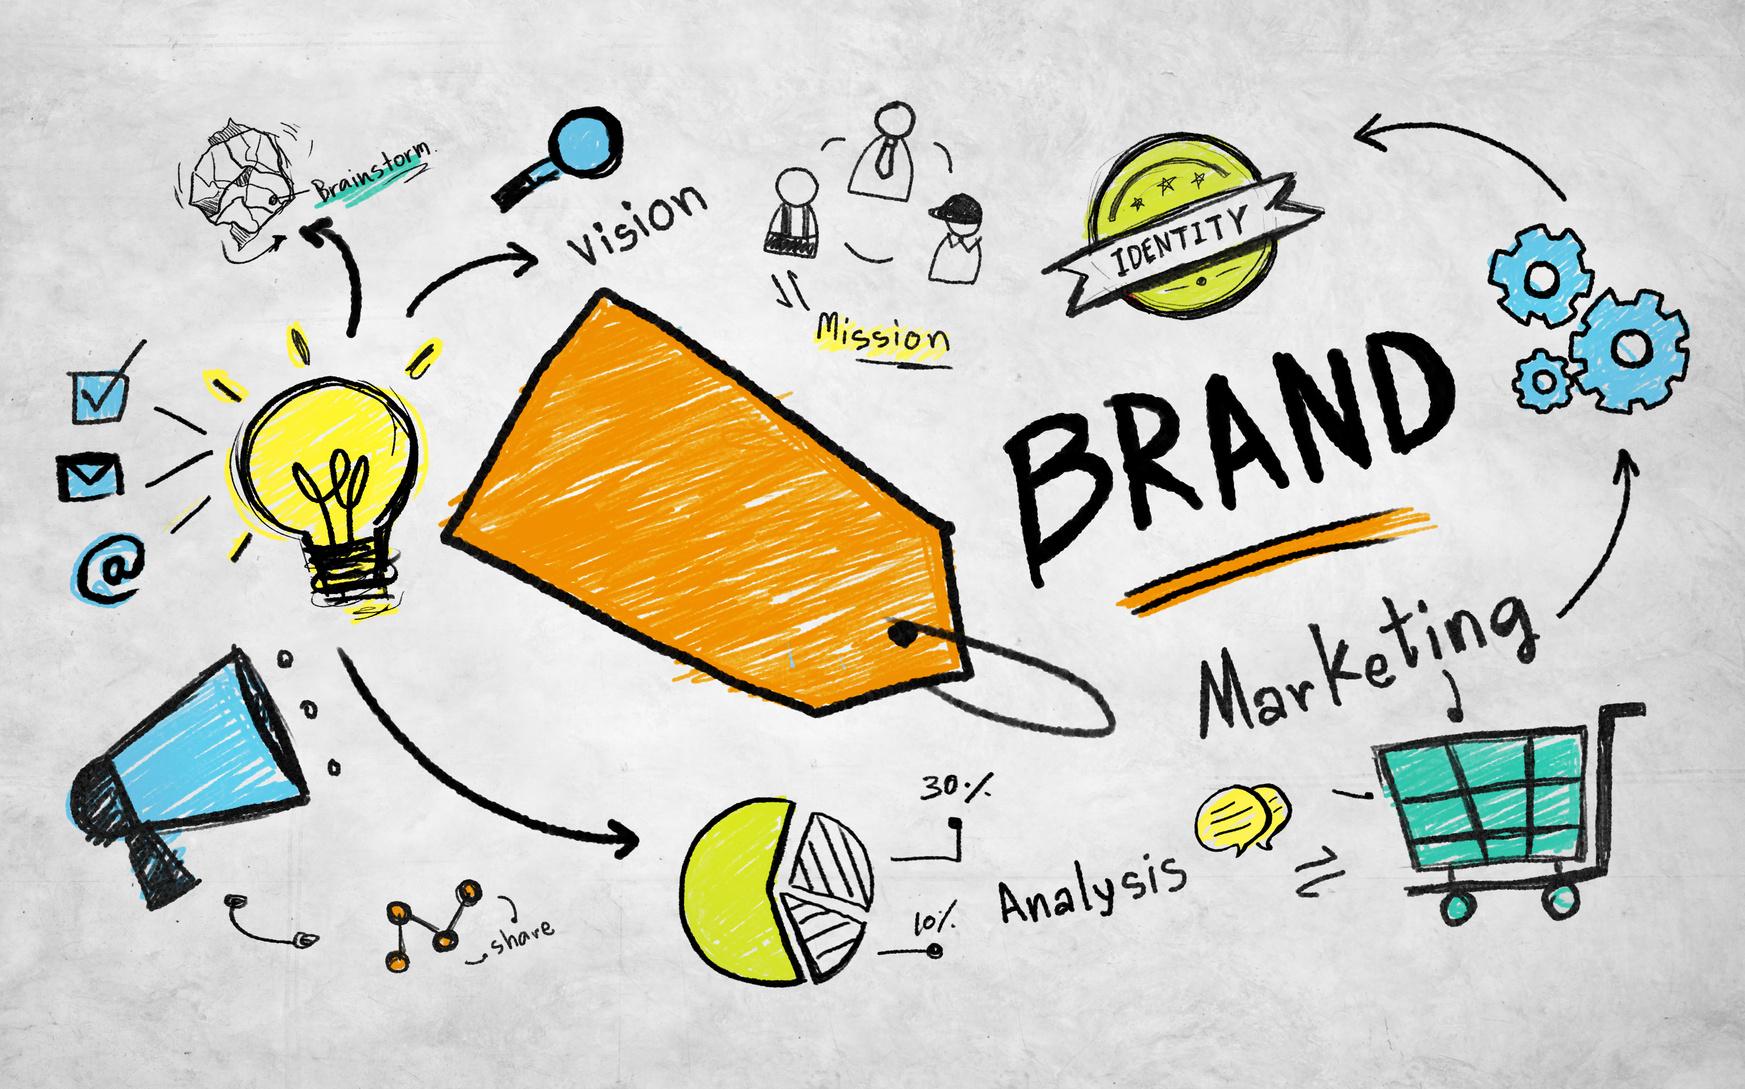 Meaning of Branding in Towards Market